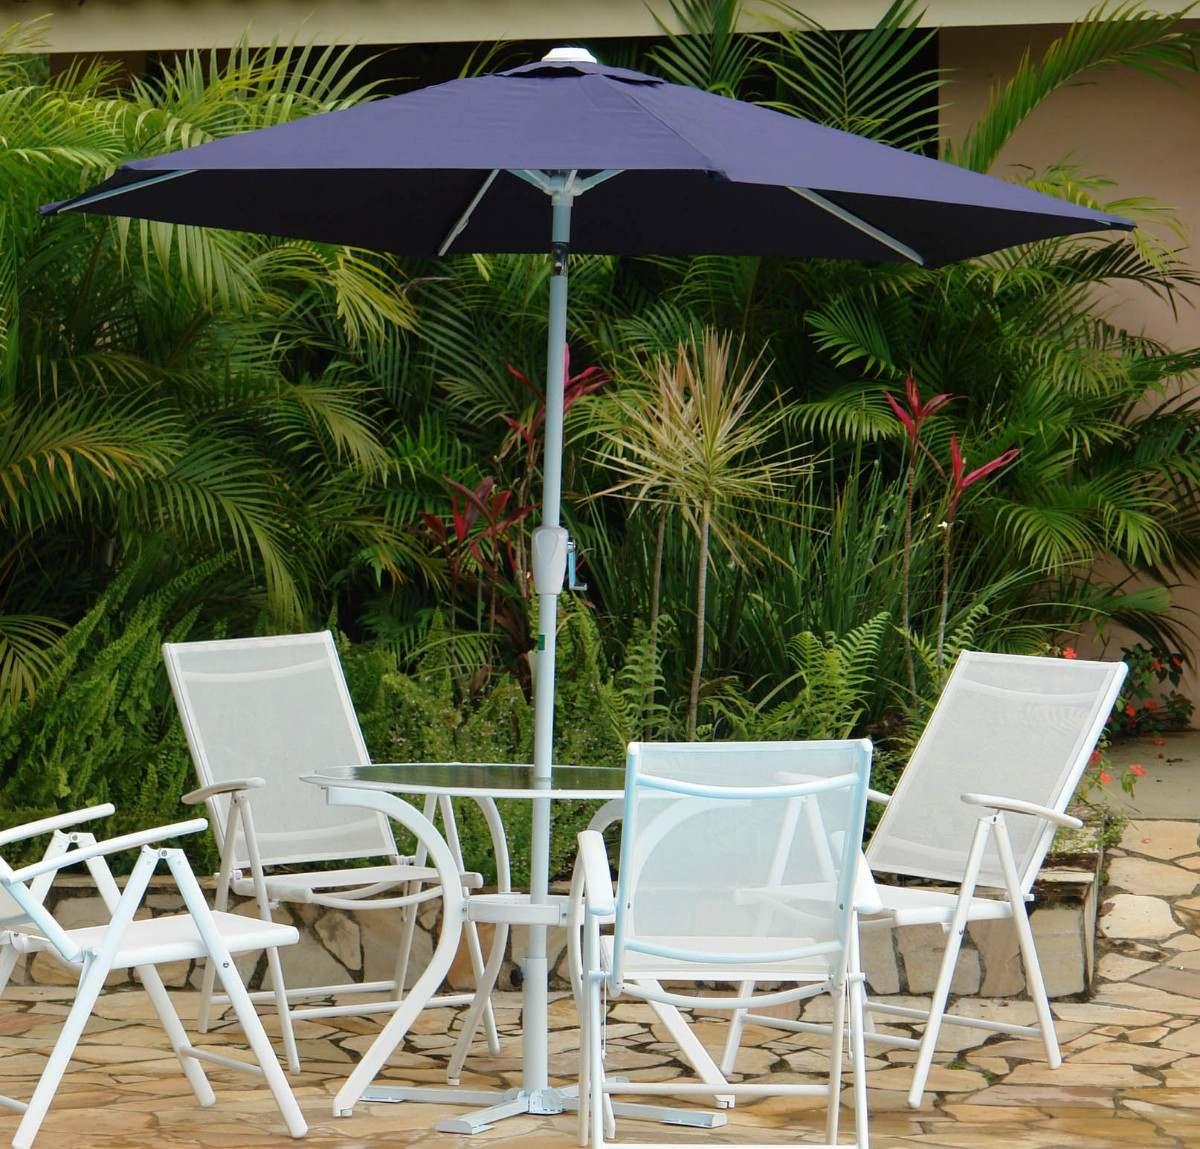 mesa jardim ombrelone:Ombrelone Milano 2,7 Mts Garden Nautika – Guarda Sol Piscina – R$ 270